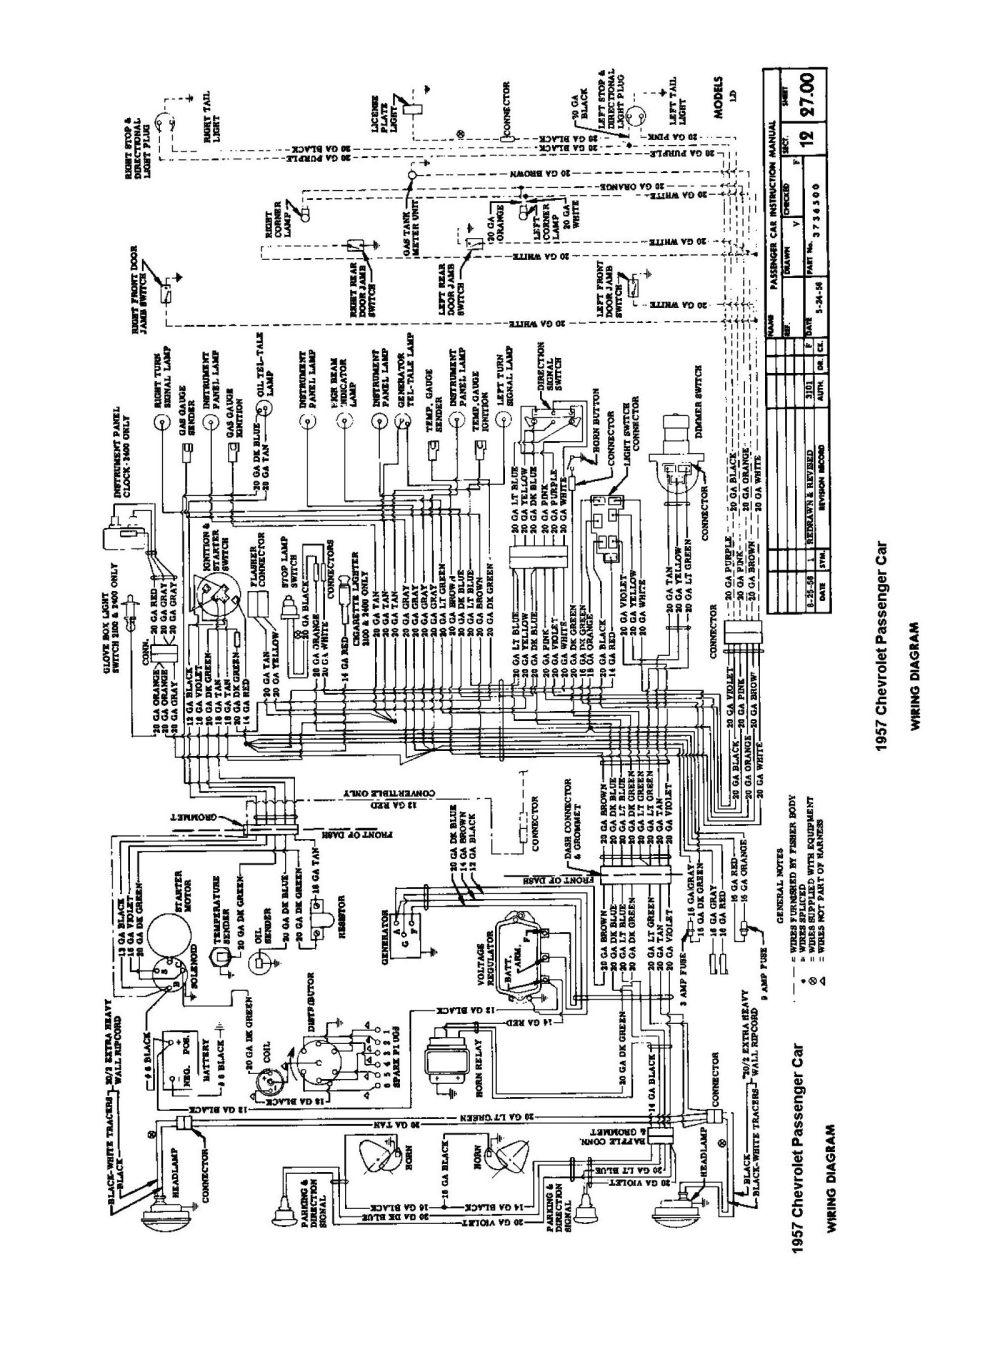 medium resolution of 1957 1957 car wiring diagrams 1957 passenger car wiring